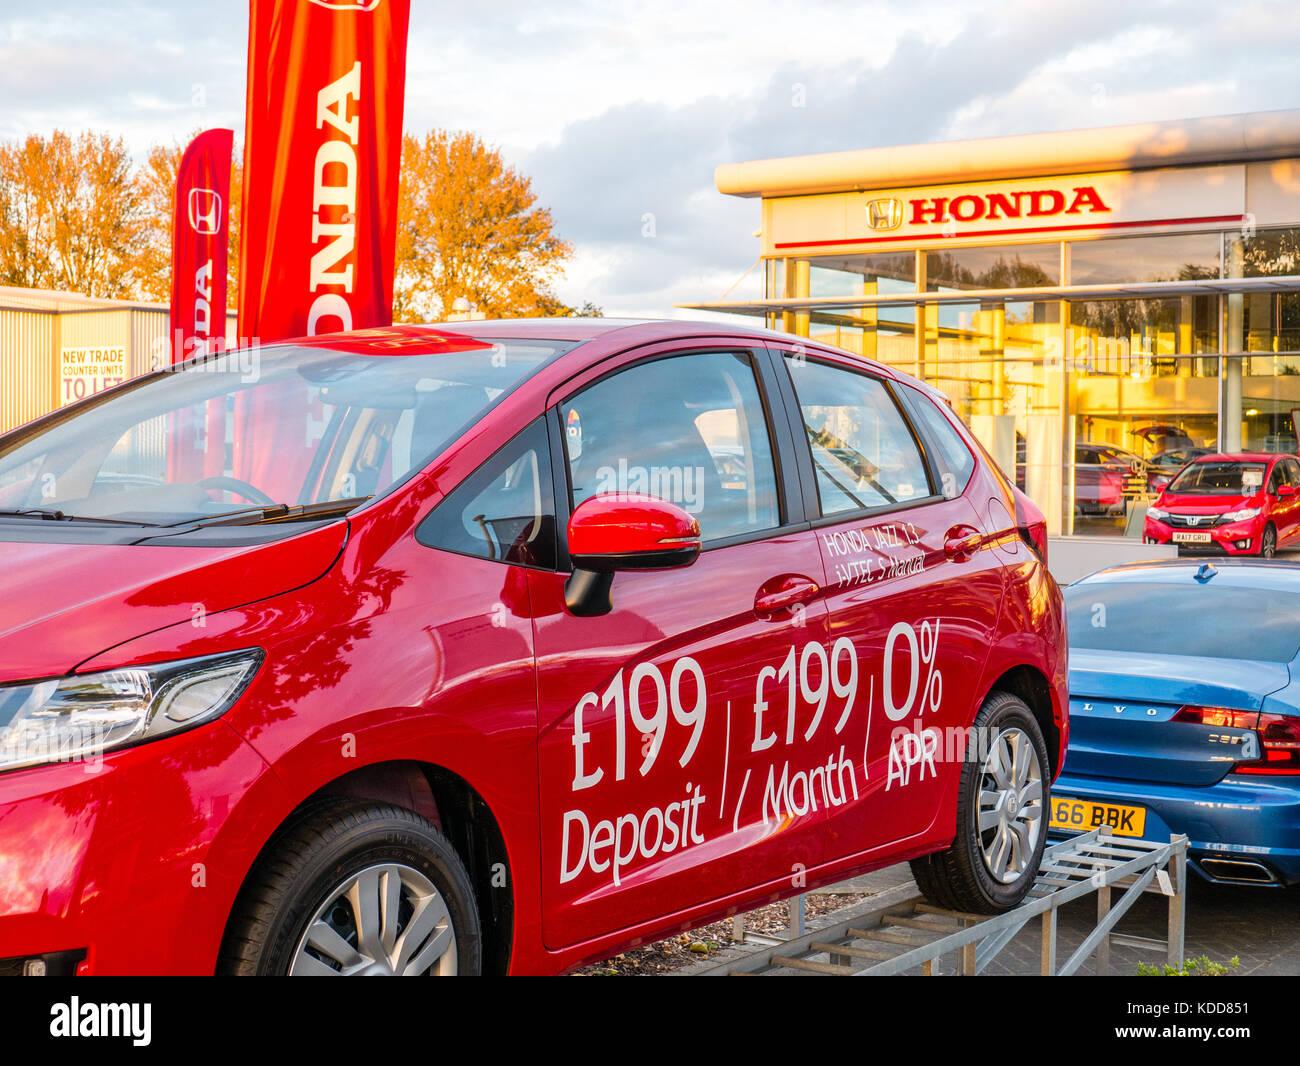 Honda Händler, Autohaus, Reading, Berkshire, England Stockbild